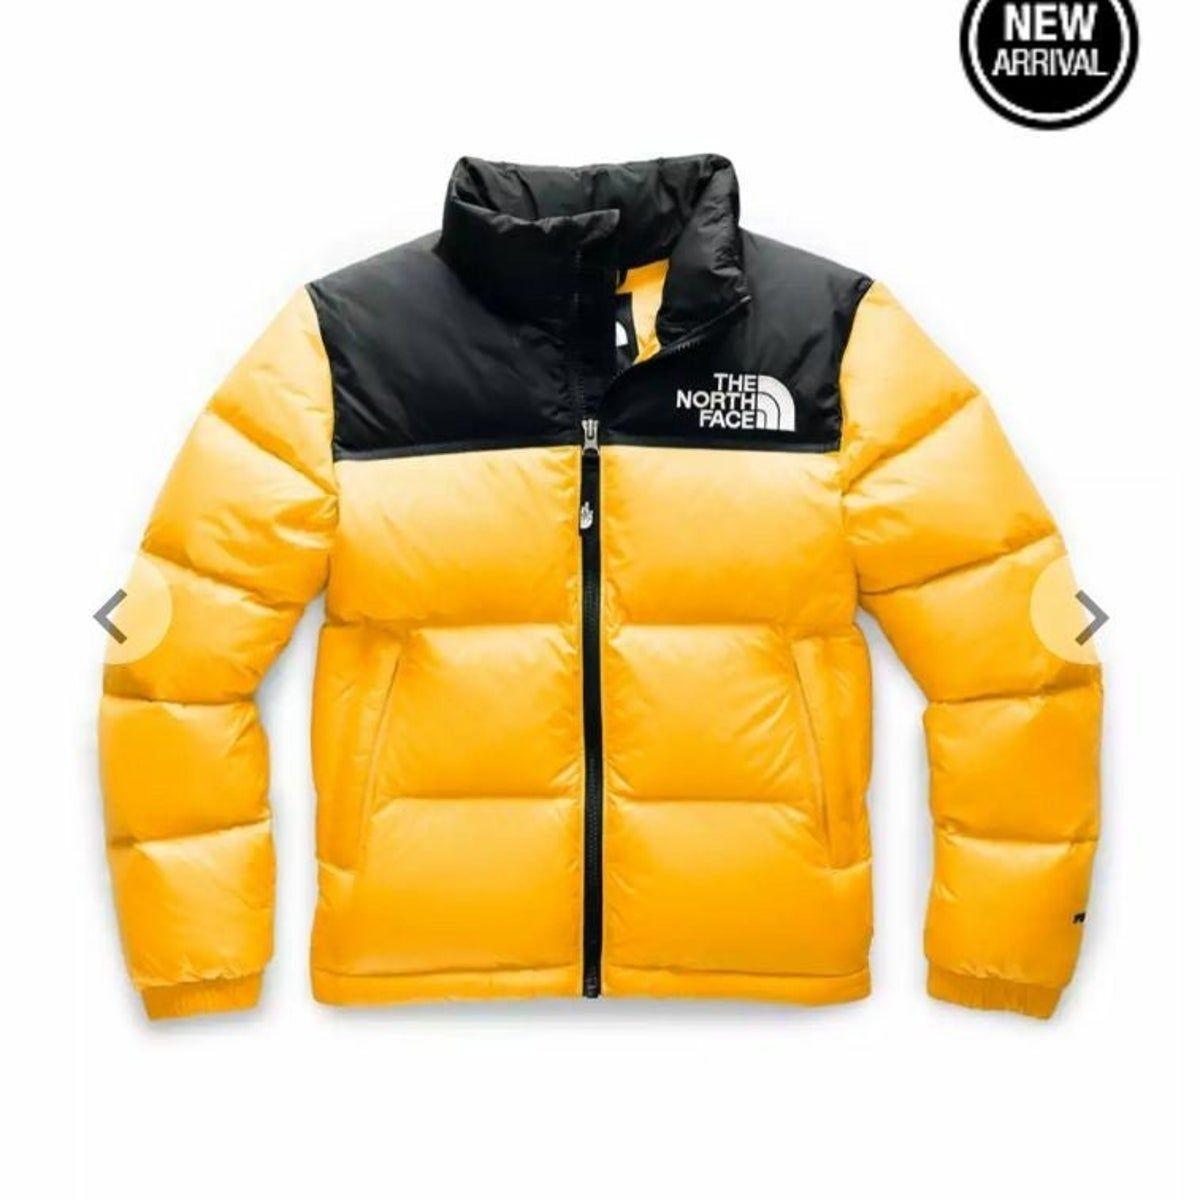 The North Face 1996 Retro Nuptse Youth L Kids North Face Jackets North Face Puffer Jacket Down Jacket [ 1200 x 1200 Pixel ]